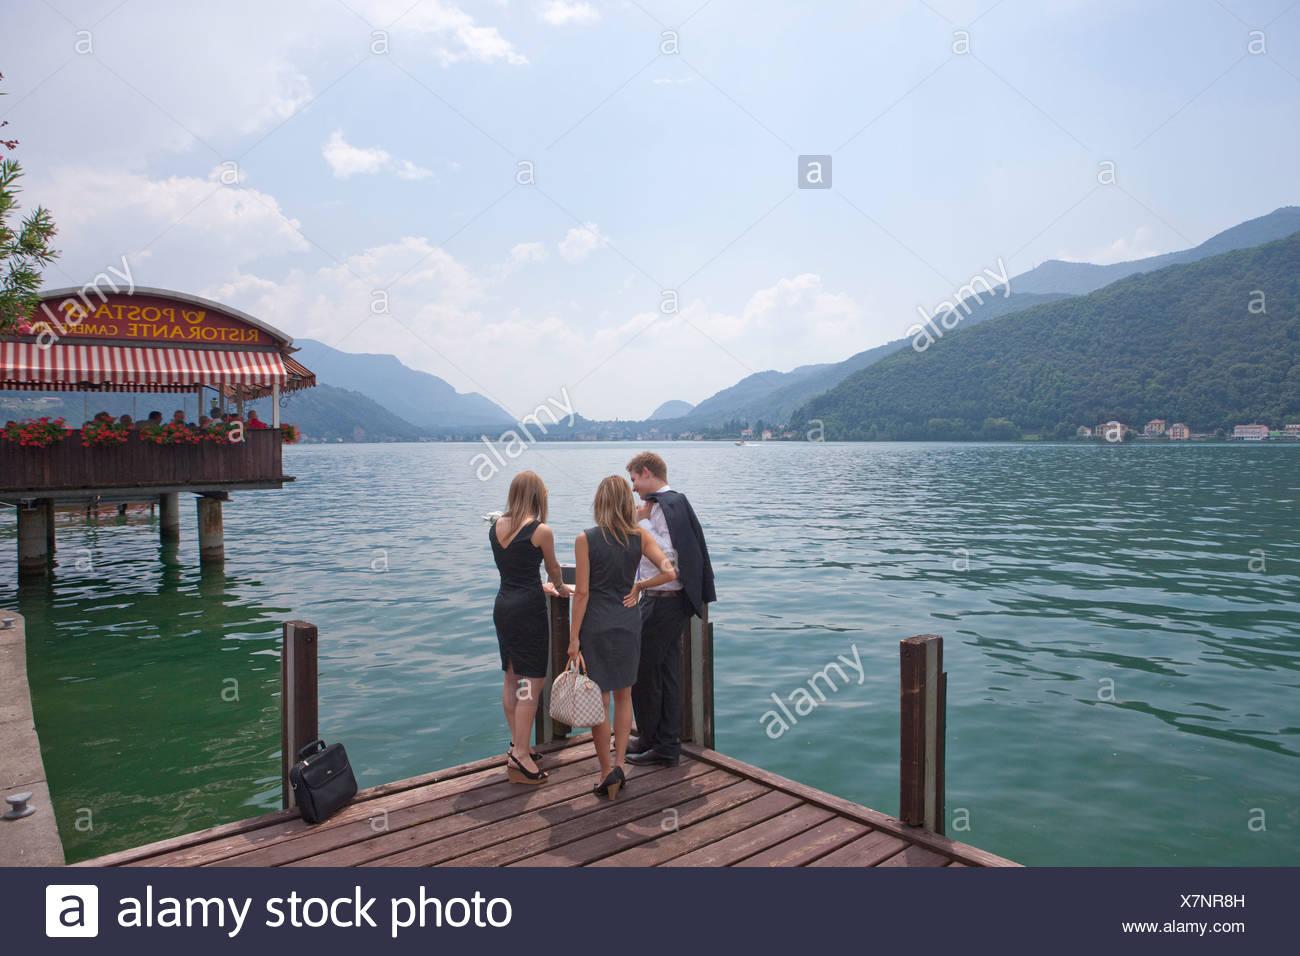 Man, woman, Lake Lugano, Morcote, work, job, occupation, profession, occupations, professions, group, drinking, canton, TI, Tici - Stock Image